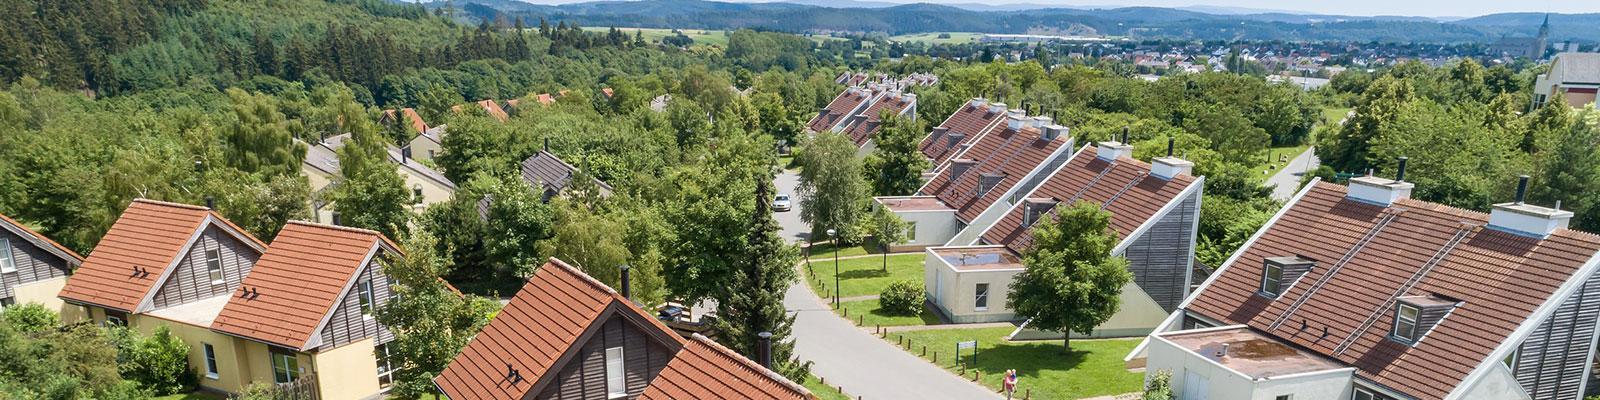 vakantiepark Nordseeküste, Duitsland